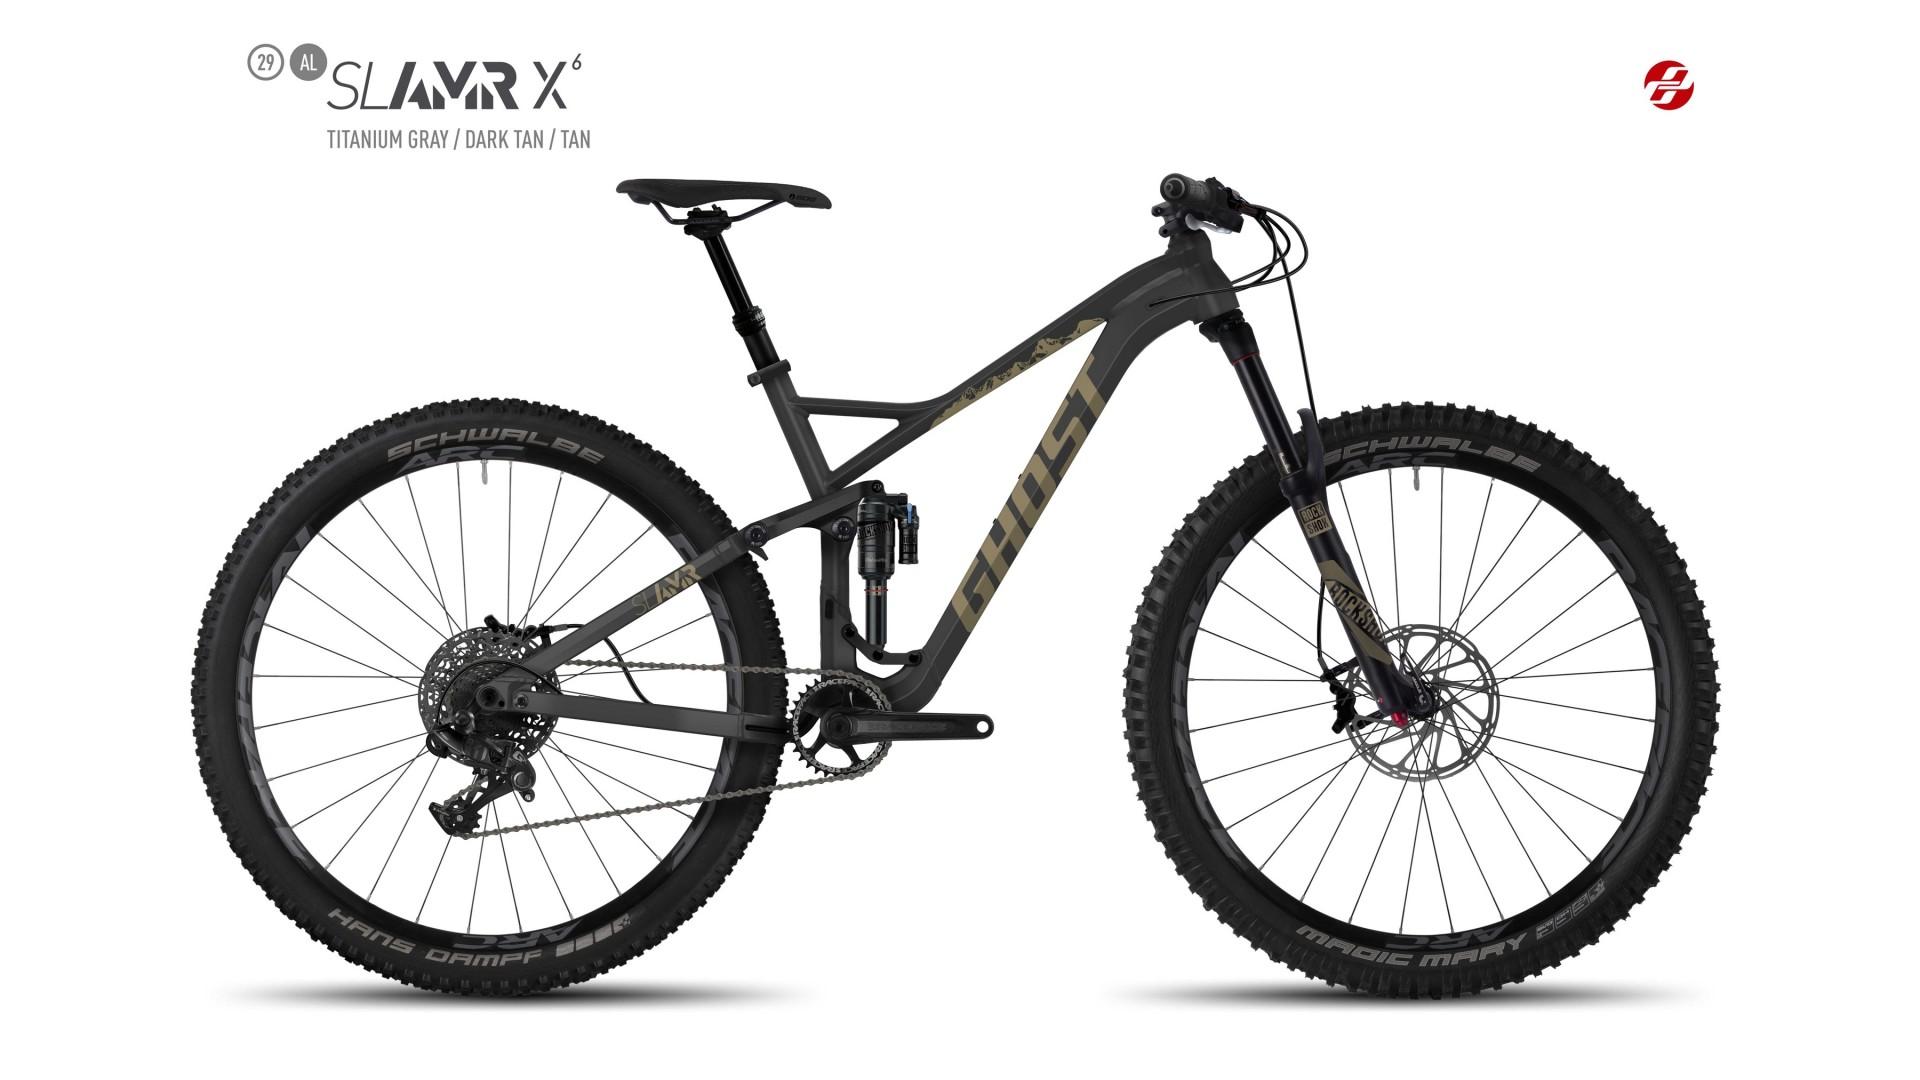 Велосипед GHOST SL AMR X6 AL 29 titaniumgrey/darktan/tan год 2017